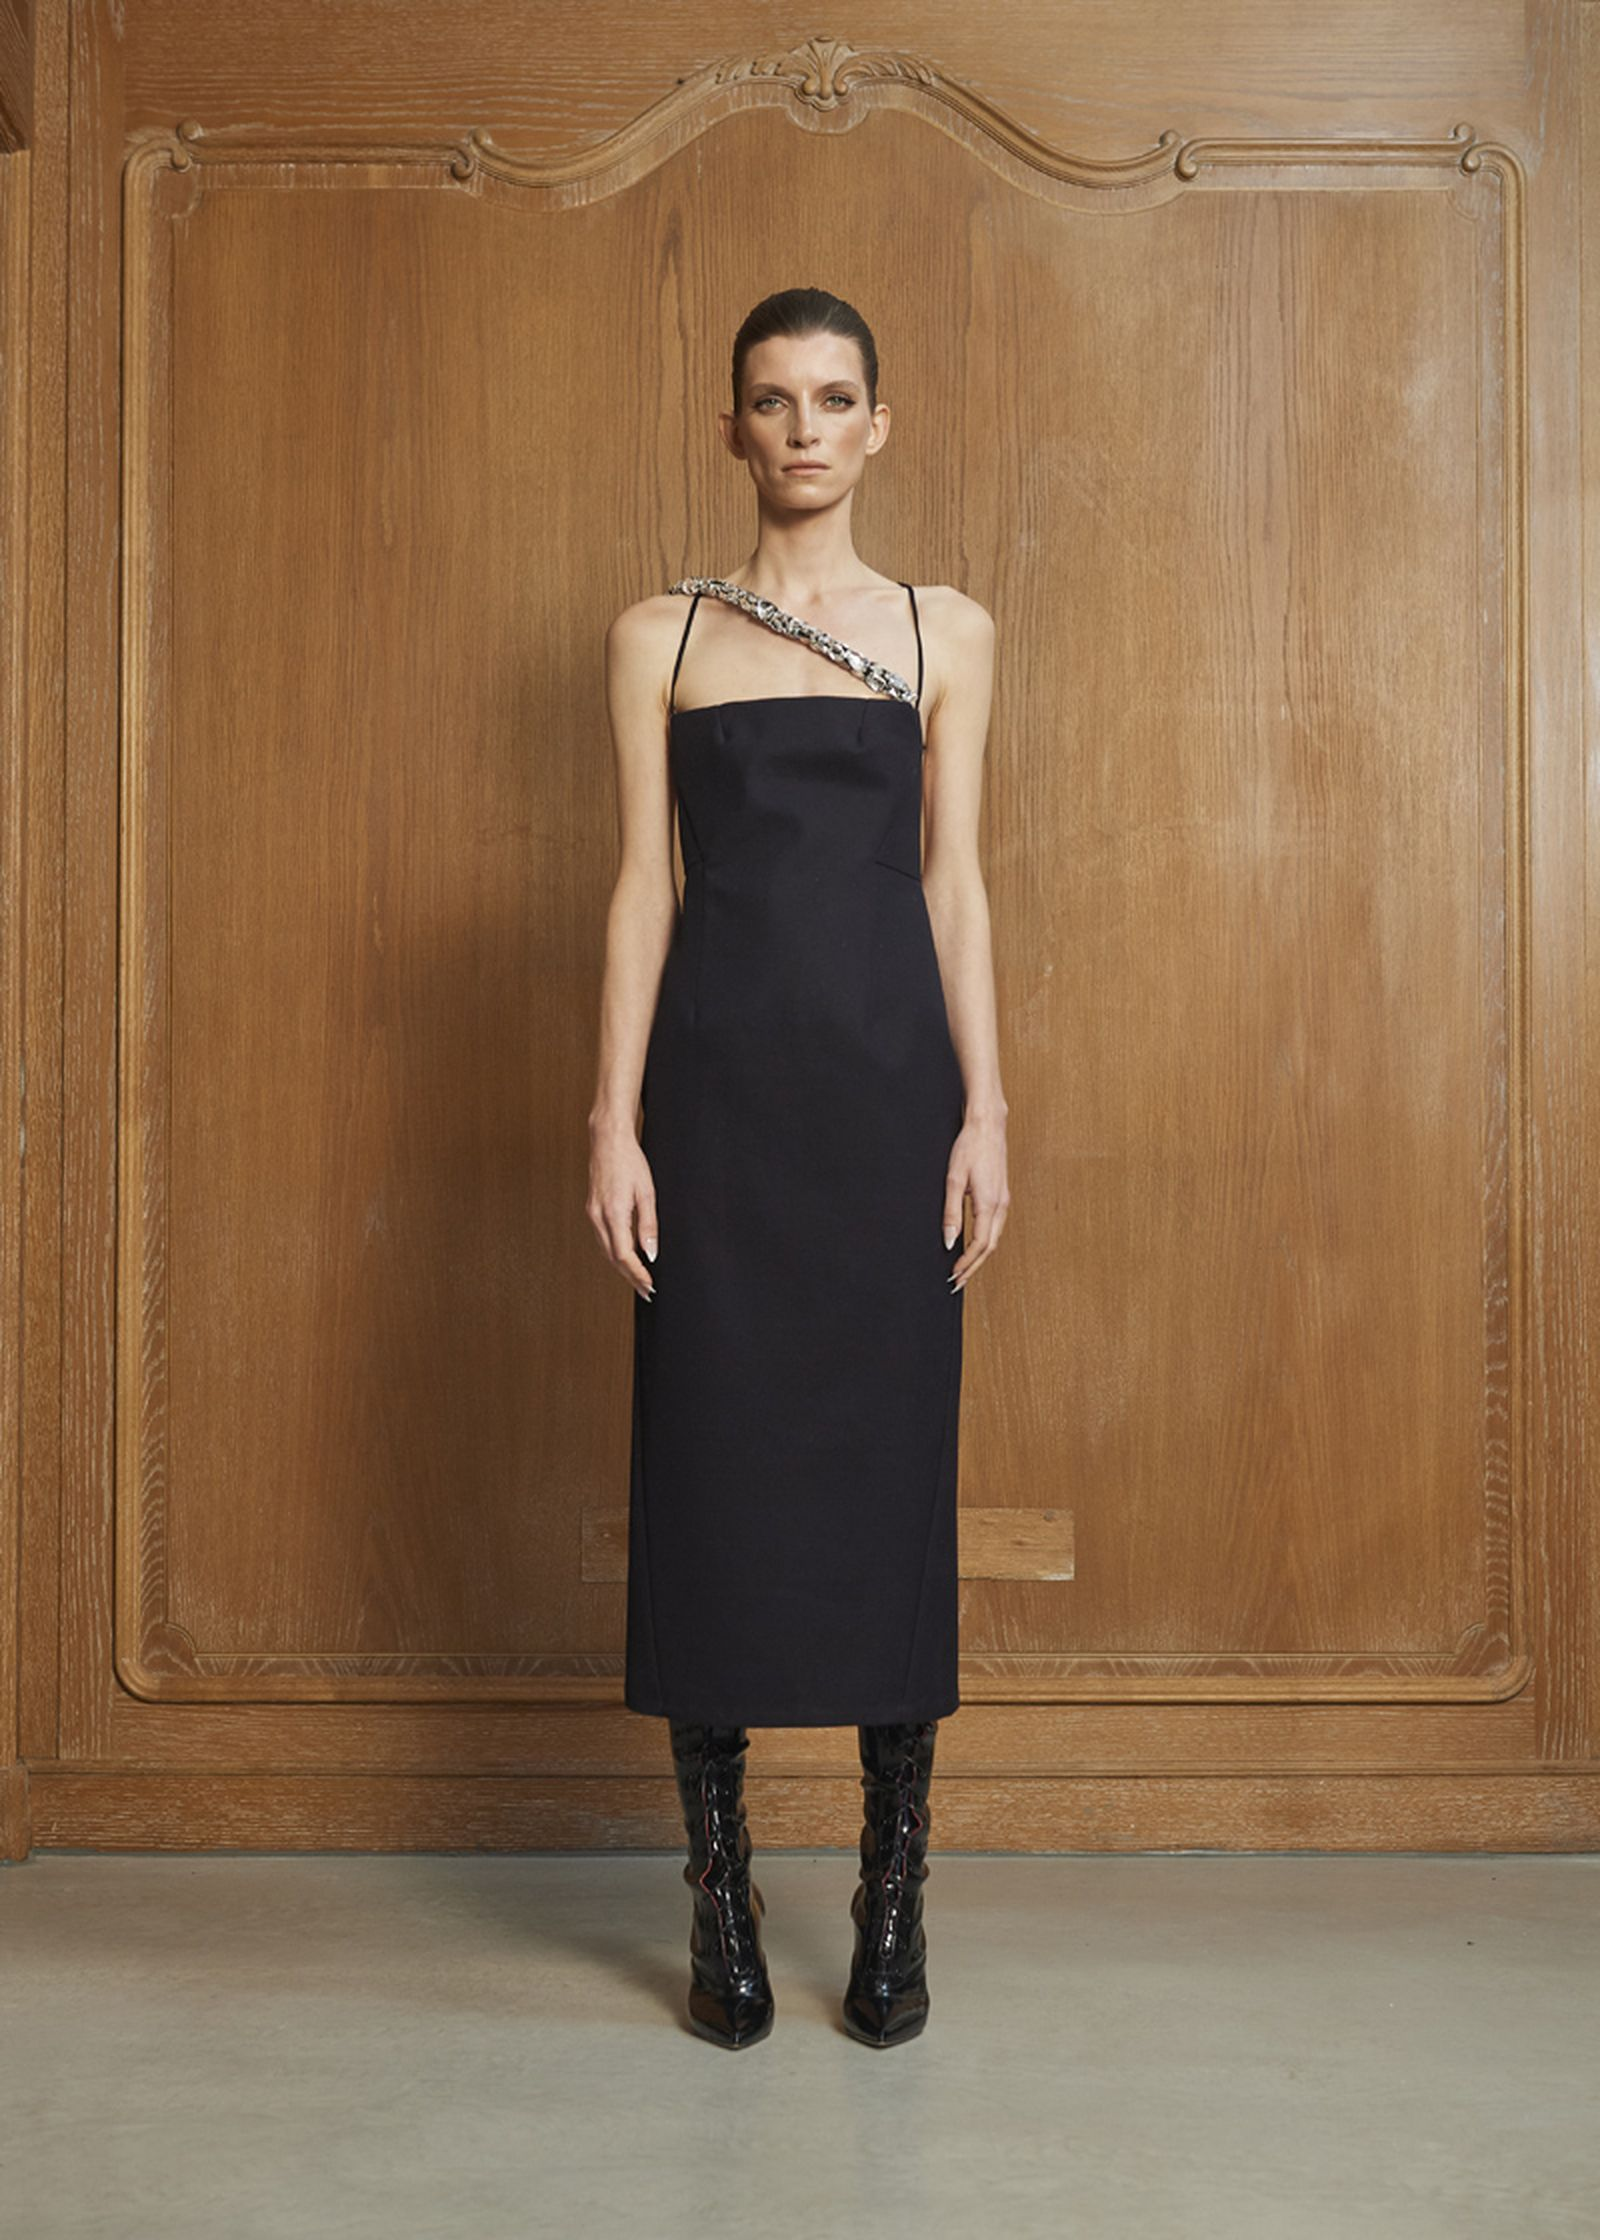 032c-rtw-womenswear-collection-paris-7